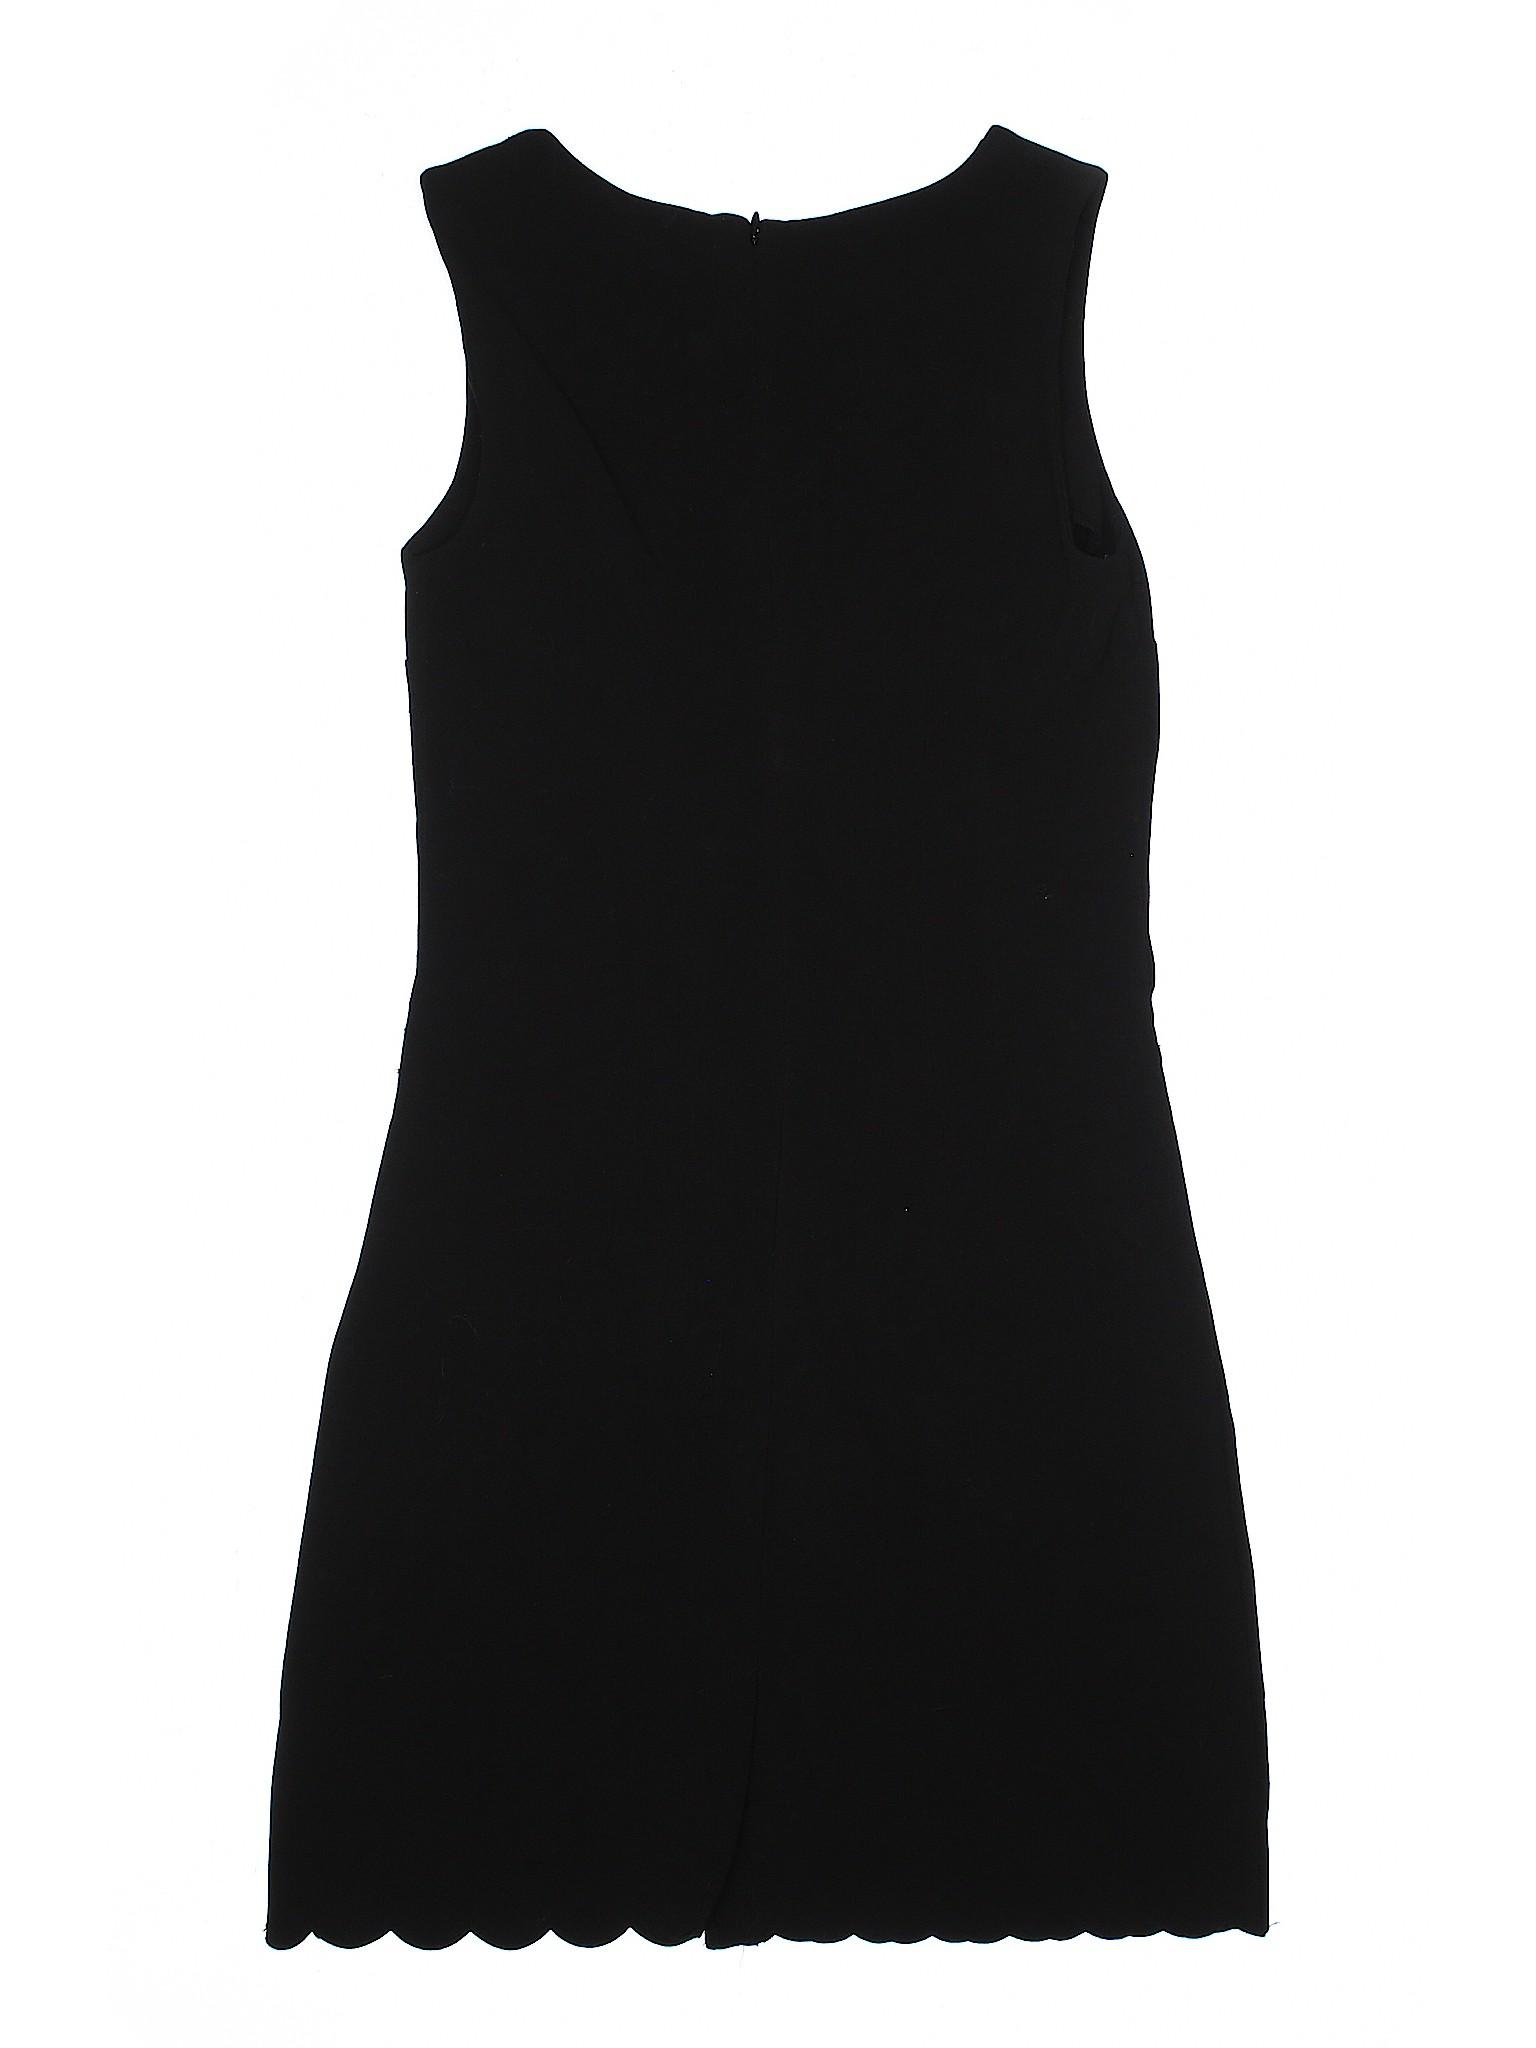 Casual Boutique winter Dress Merona Boutique winter 4RUqnB